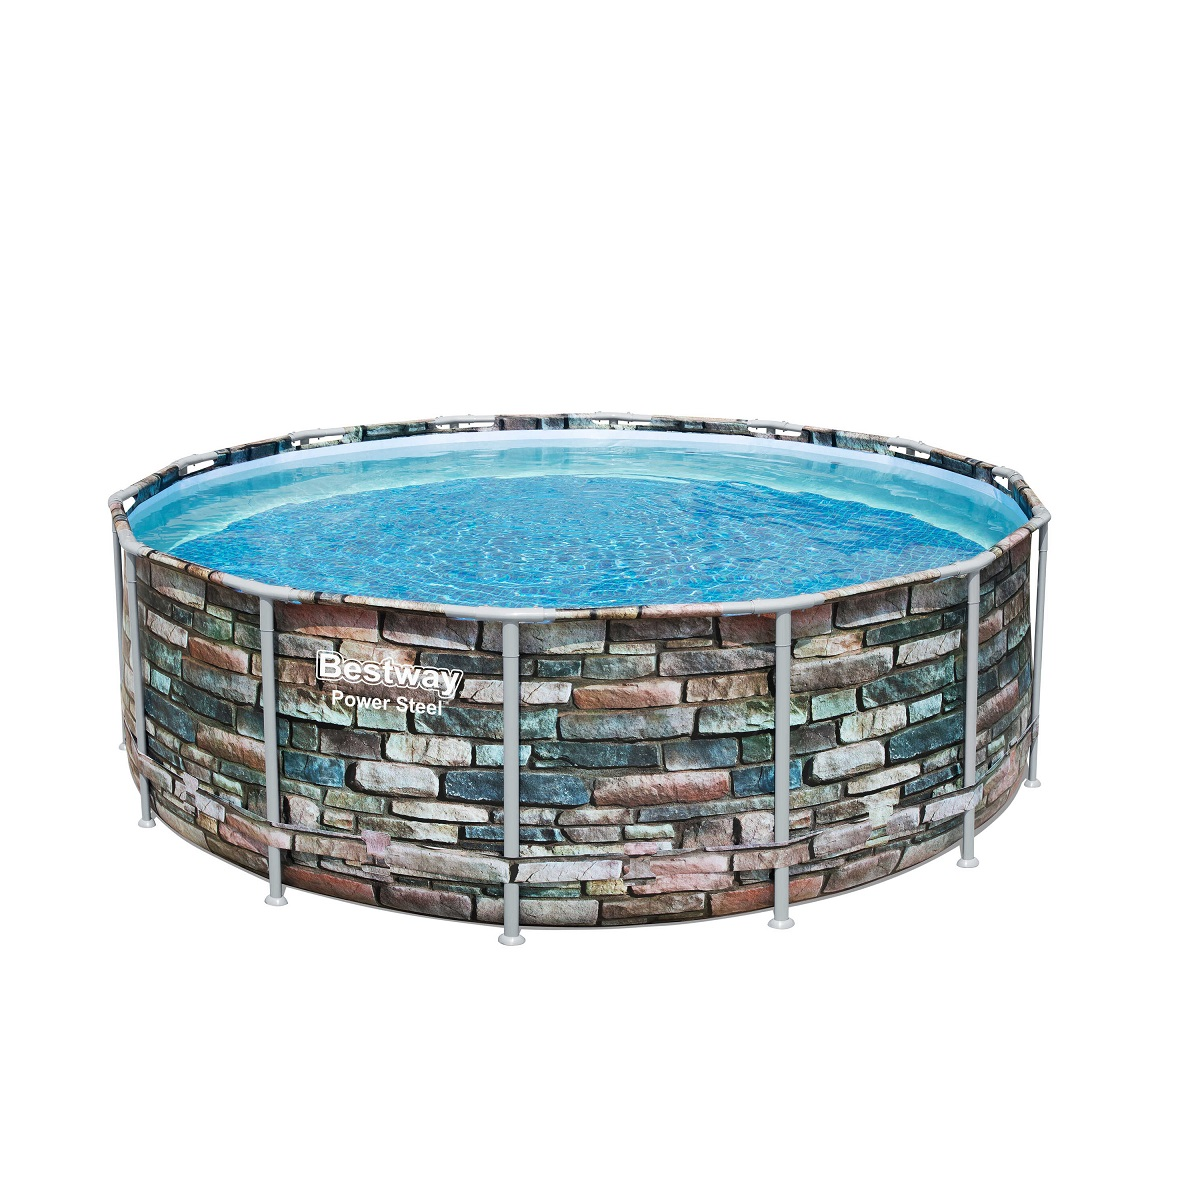 Bazén BESTWAY Power Steel 427 x 122 cm set s filtráciou